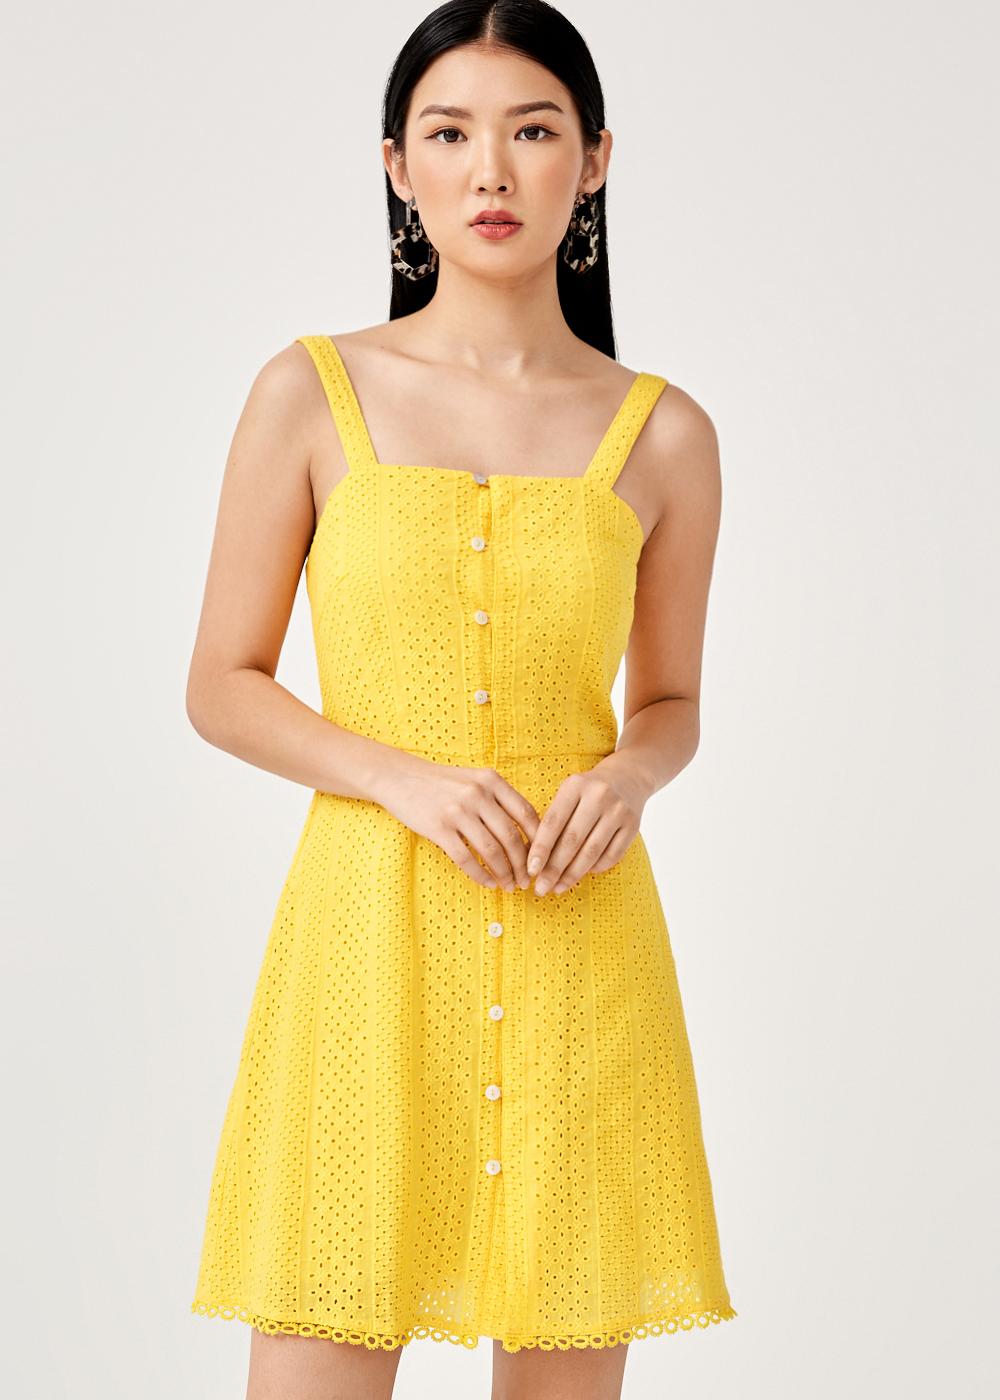 Atkins Broderie Anglaise Mini Dress